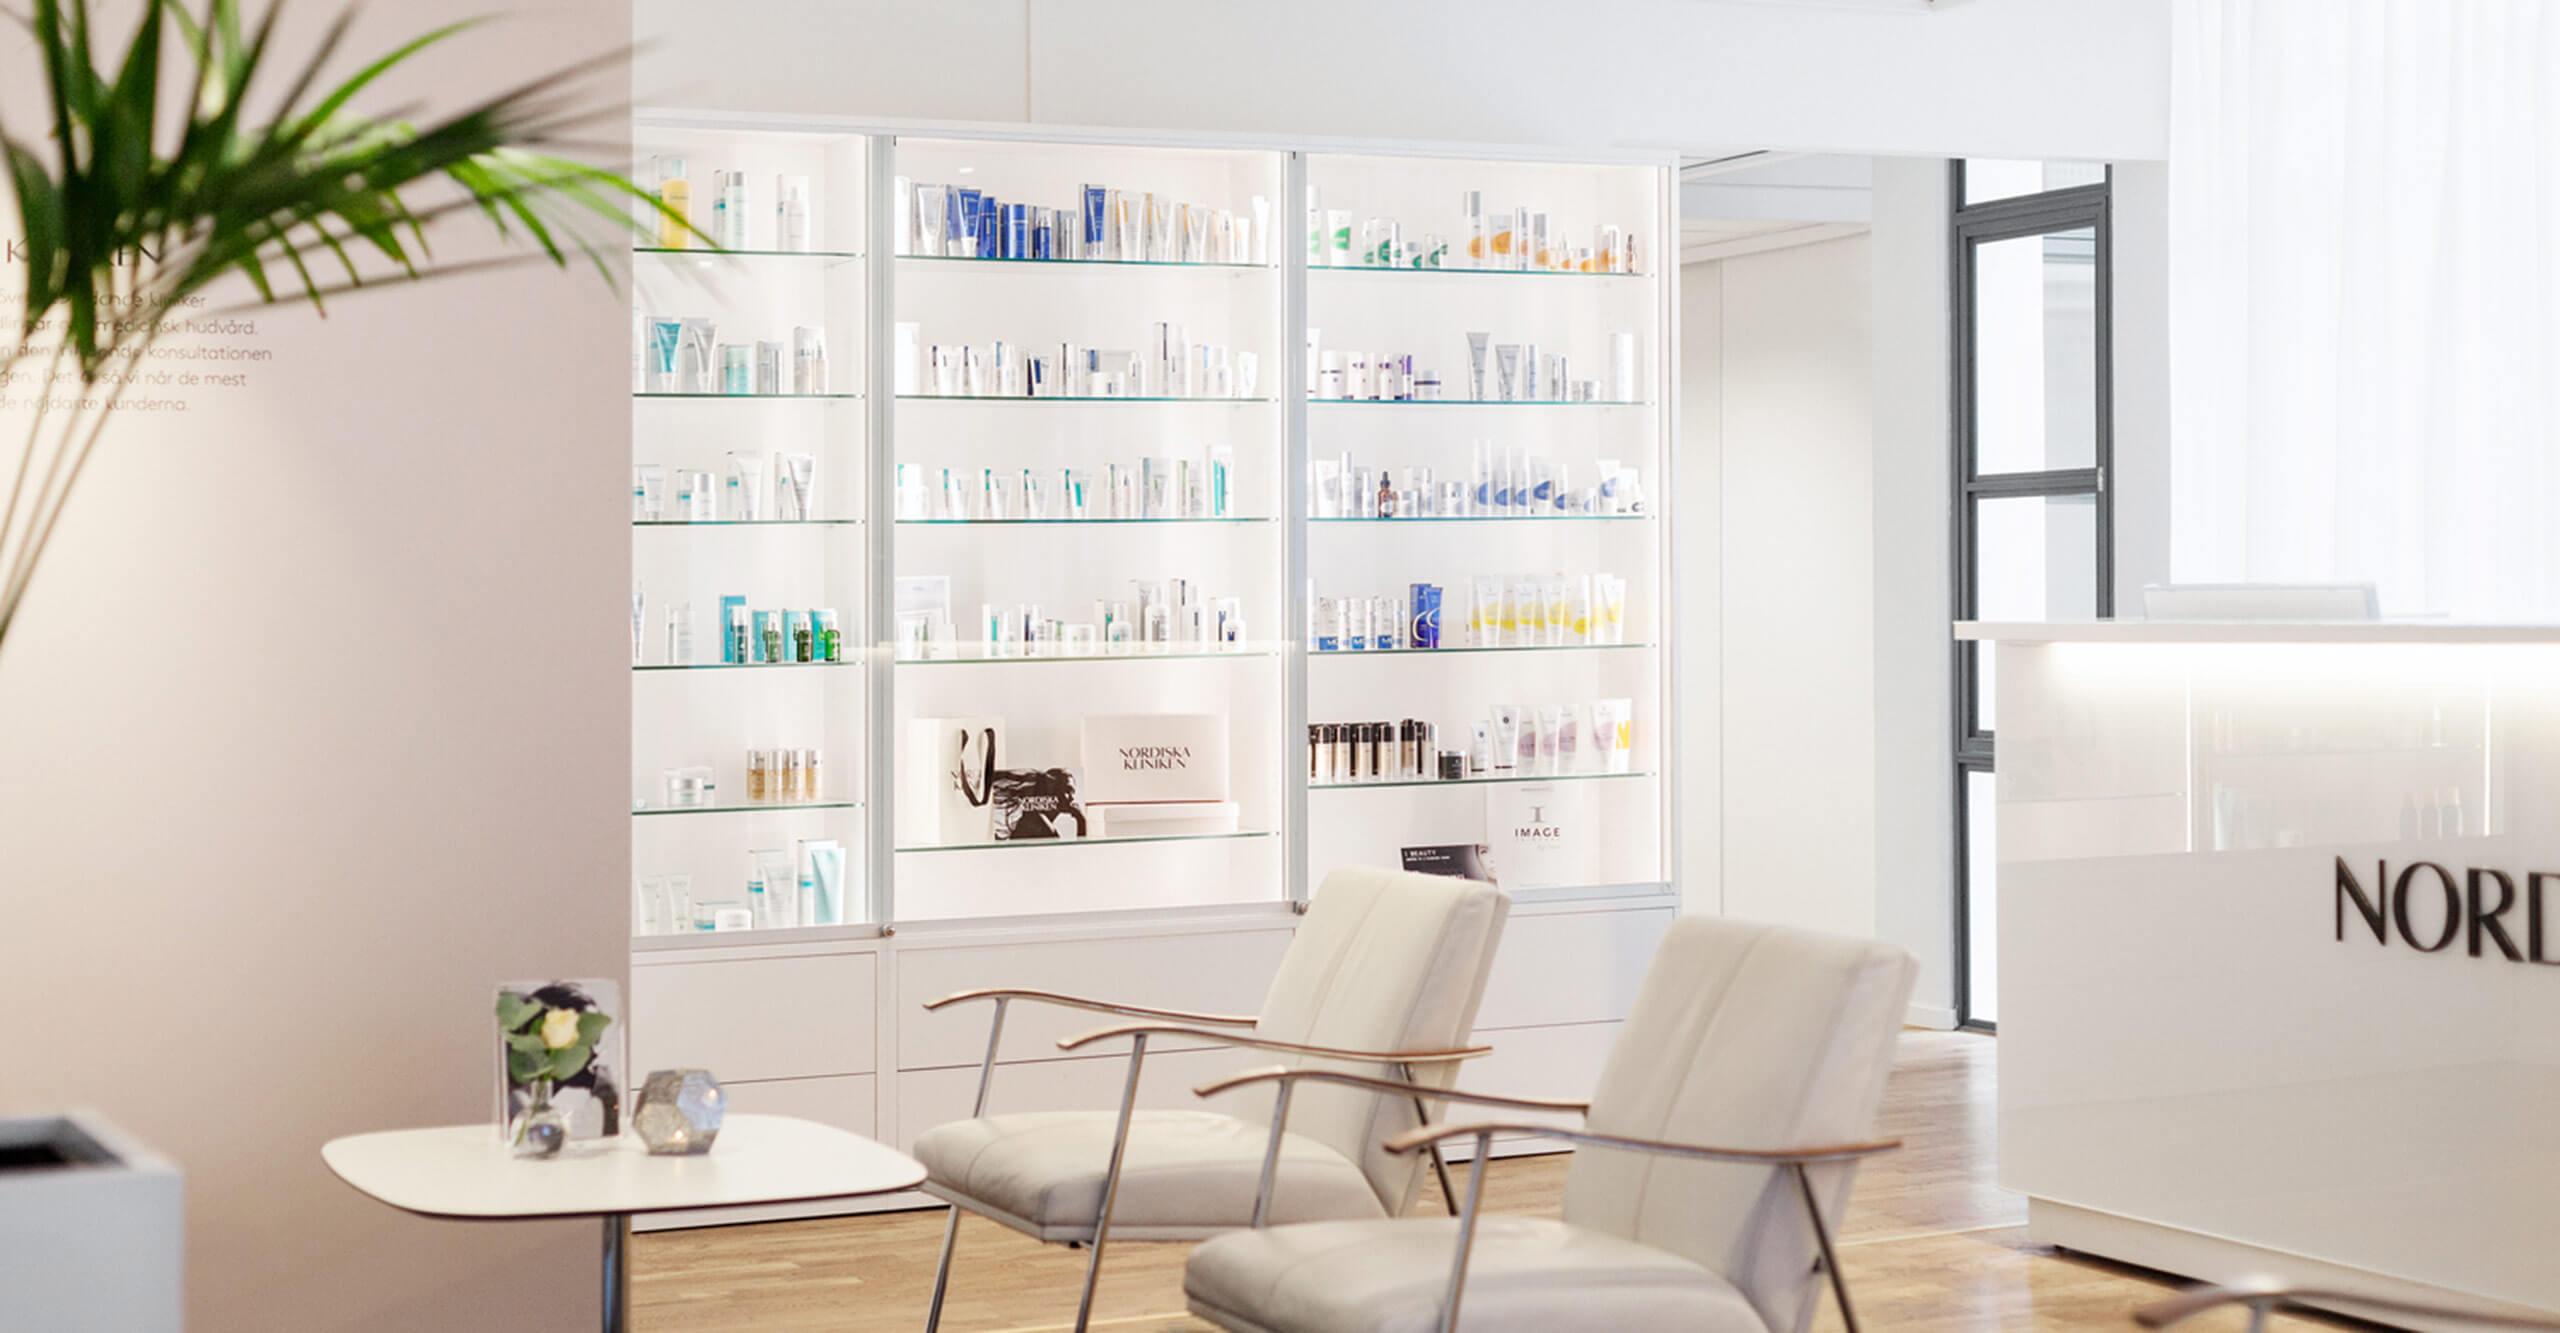 Nordiska Kliniken reception produkter image skincare exuviance neostrata